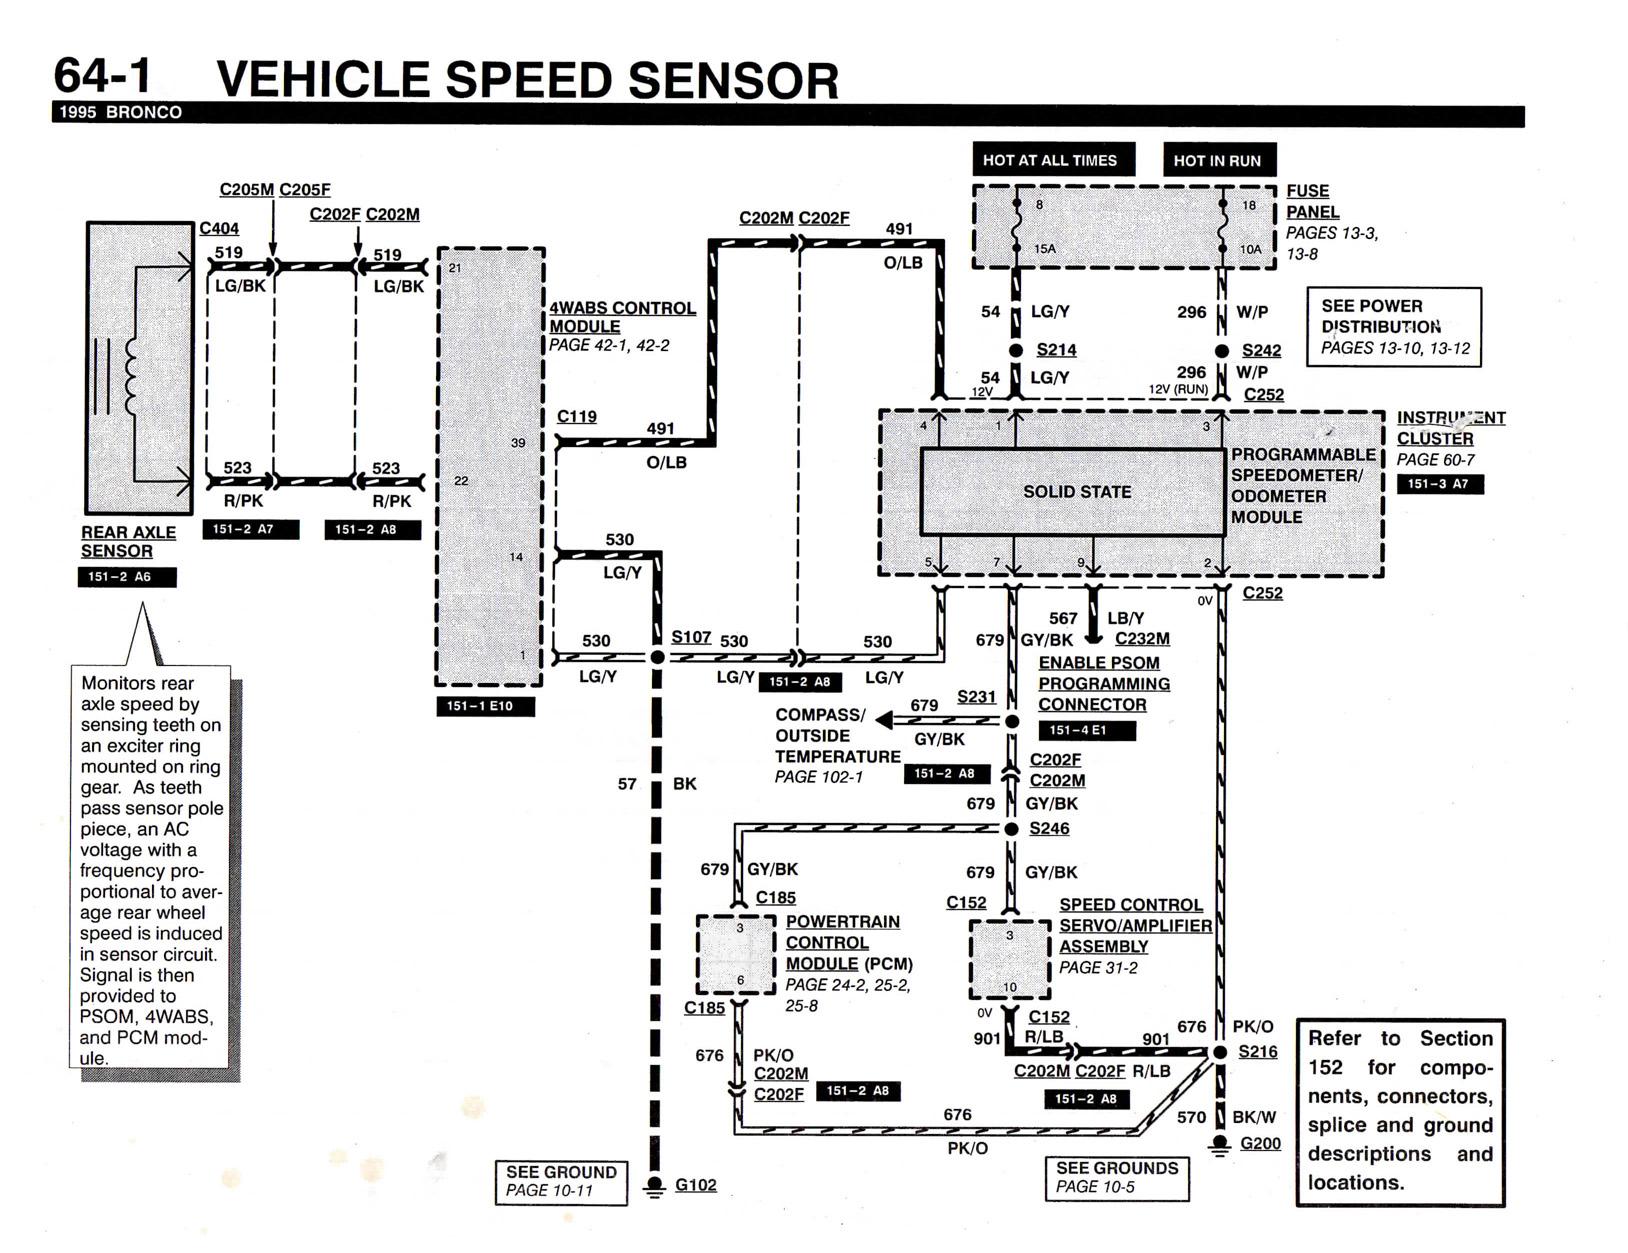 95 Dodge T56 Vss Wiring Diagrams Reverse Lockout Diagram For Vehicle Speed Sensor 1995 Bronco Transmission Electrical On Oil 89 Camaro